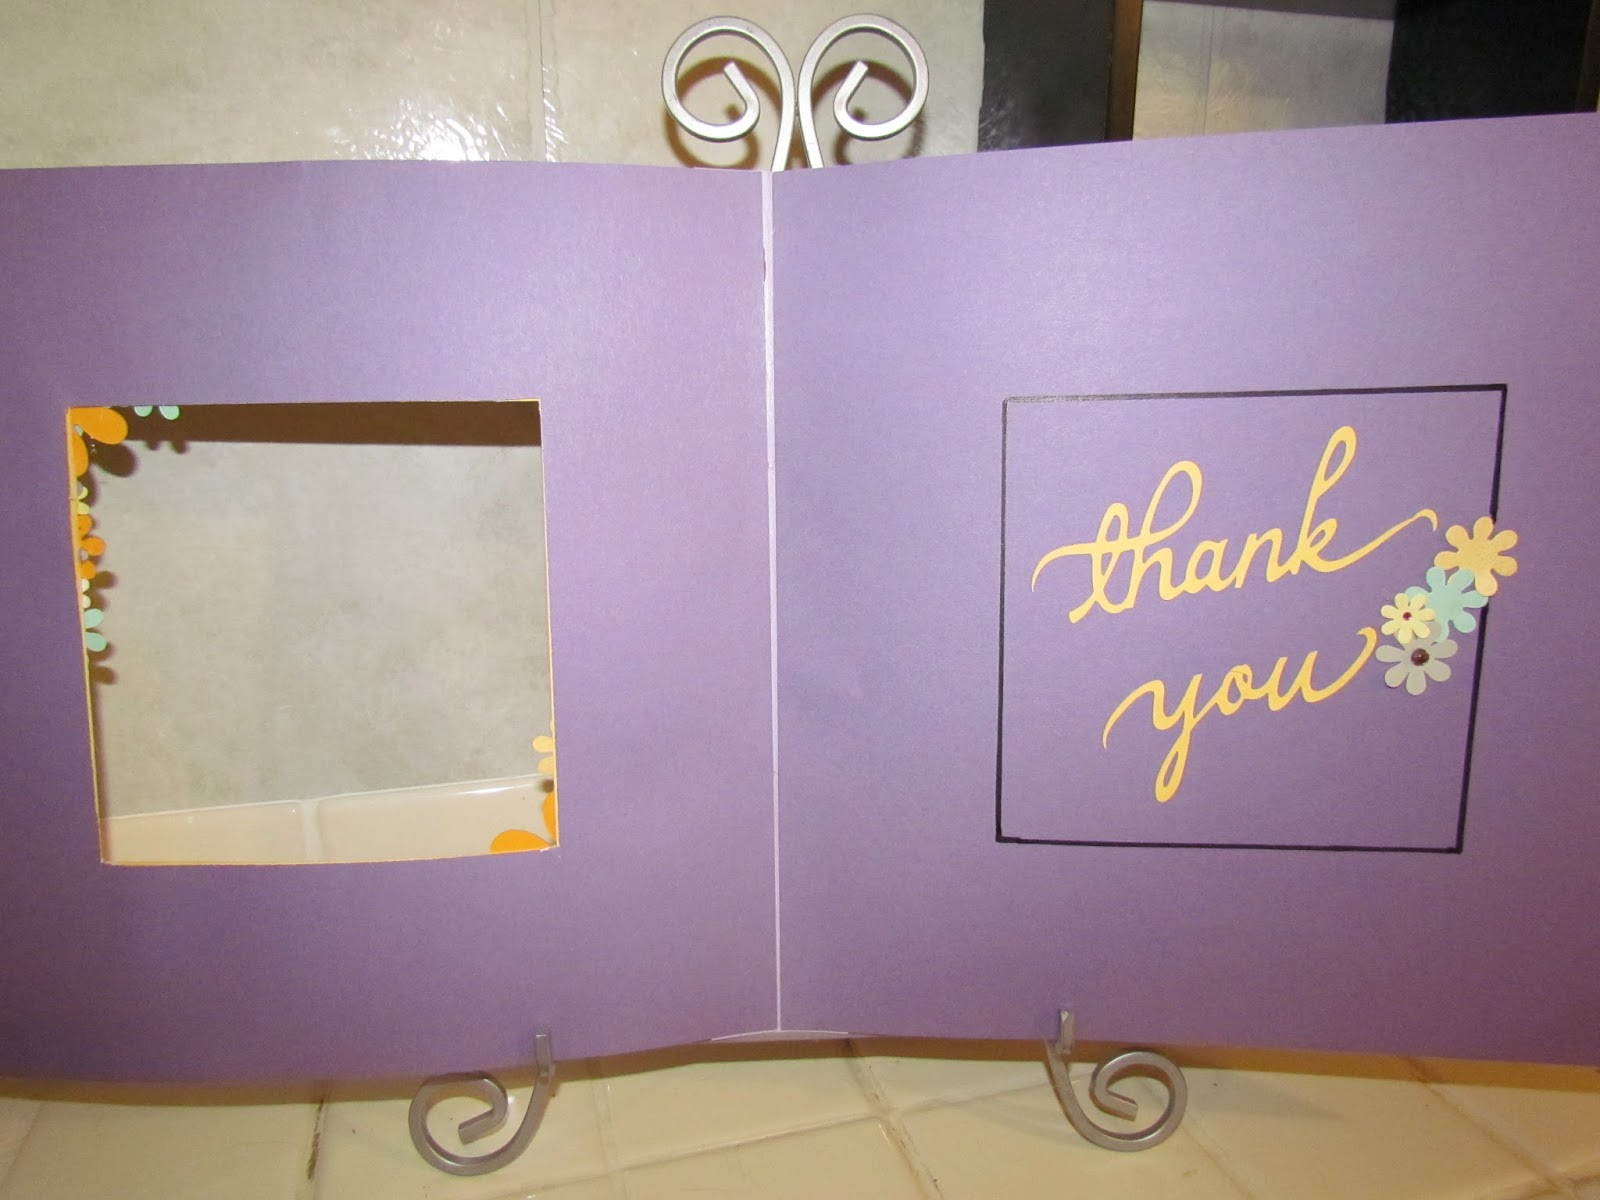 Scrap 4U: Thank you cards for teachers